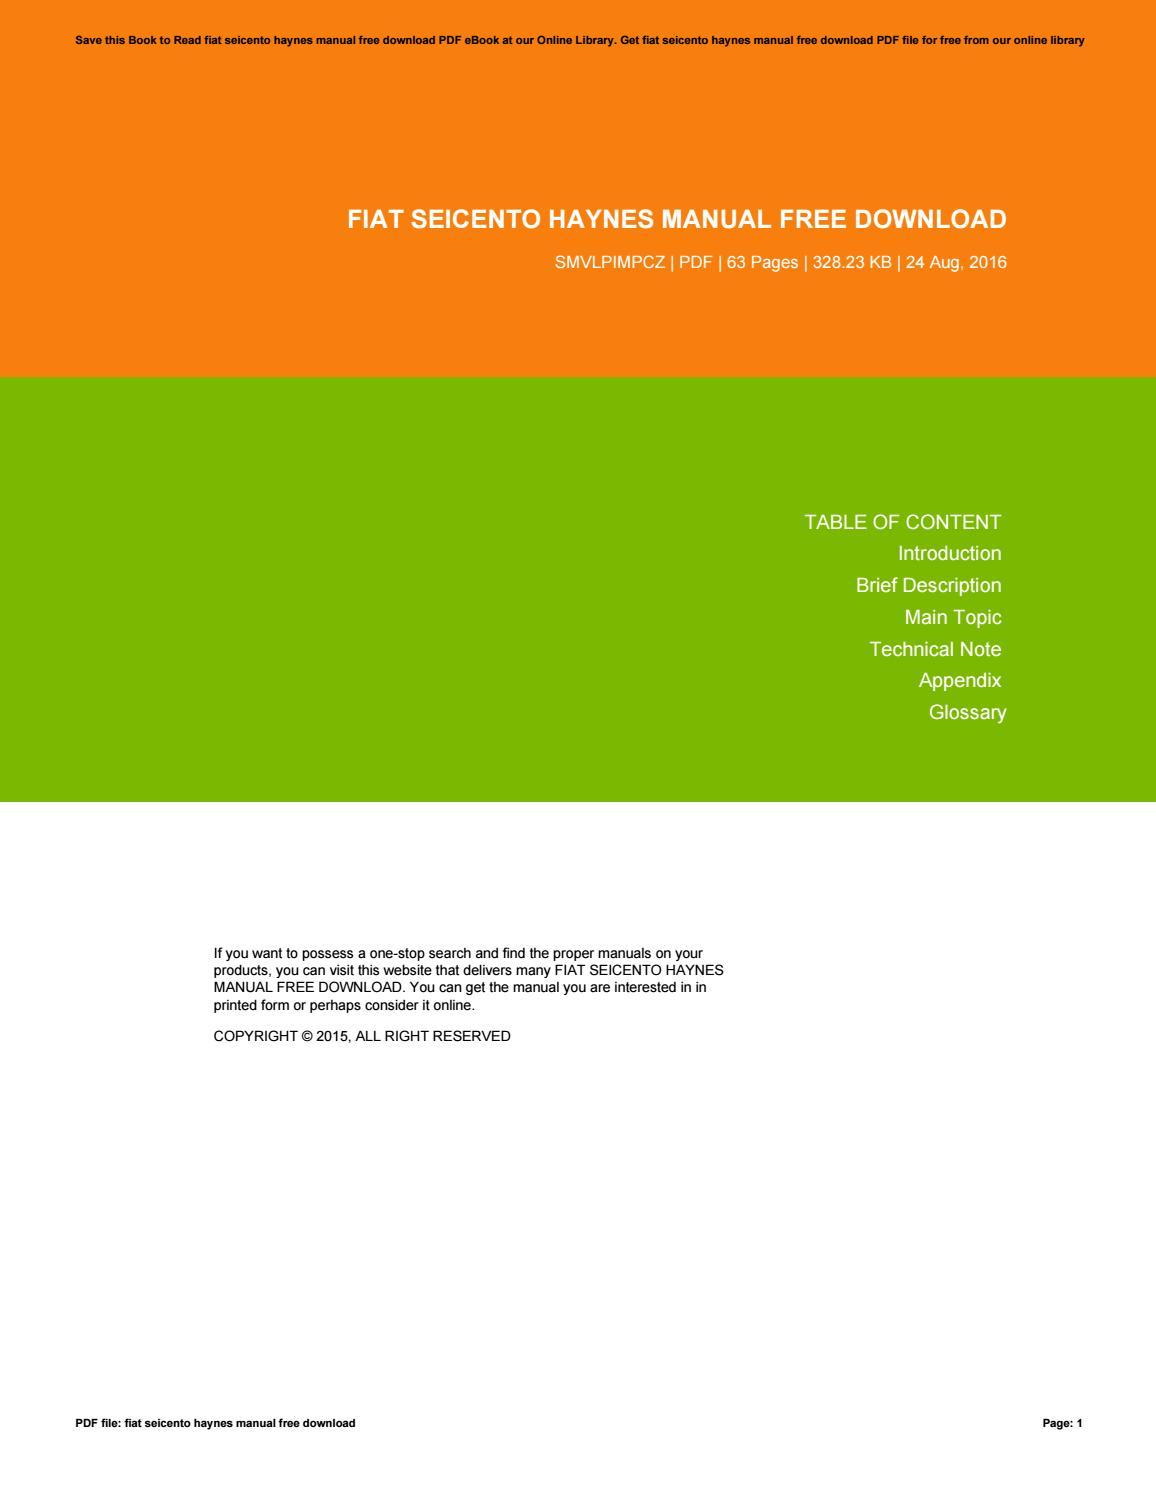 haynes pdf manuals free